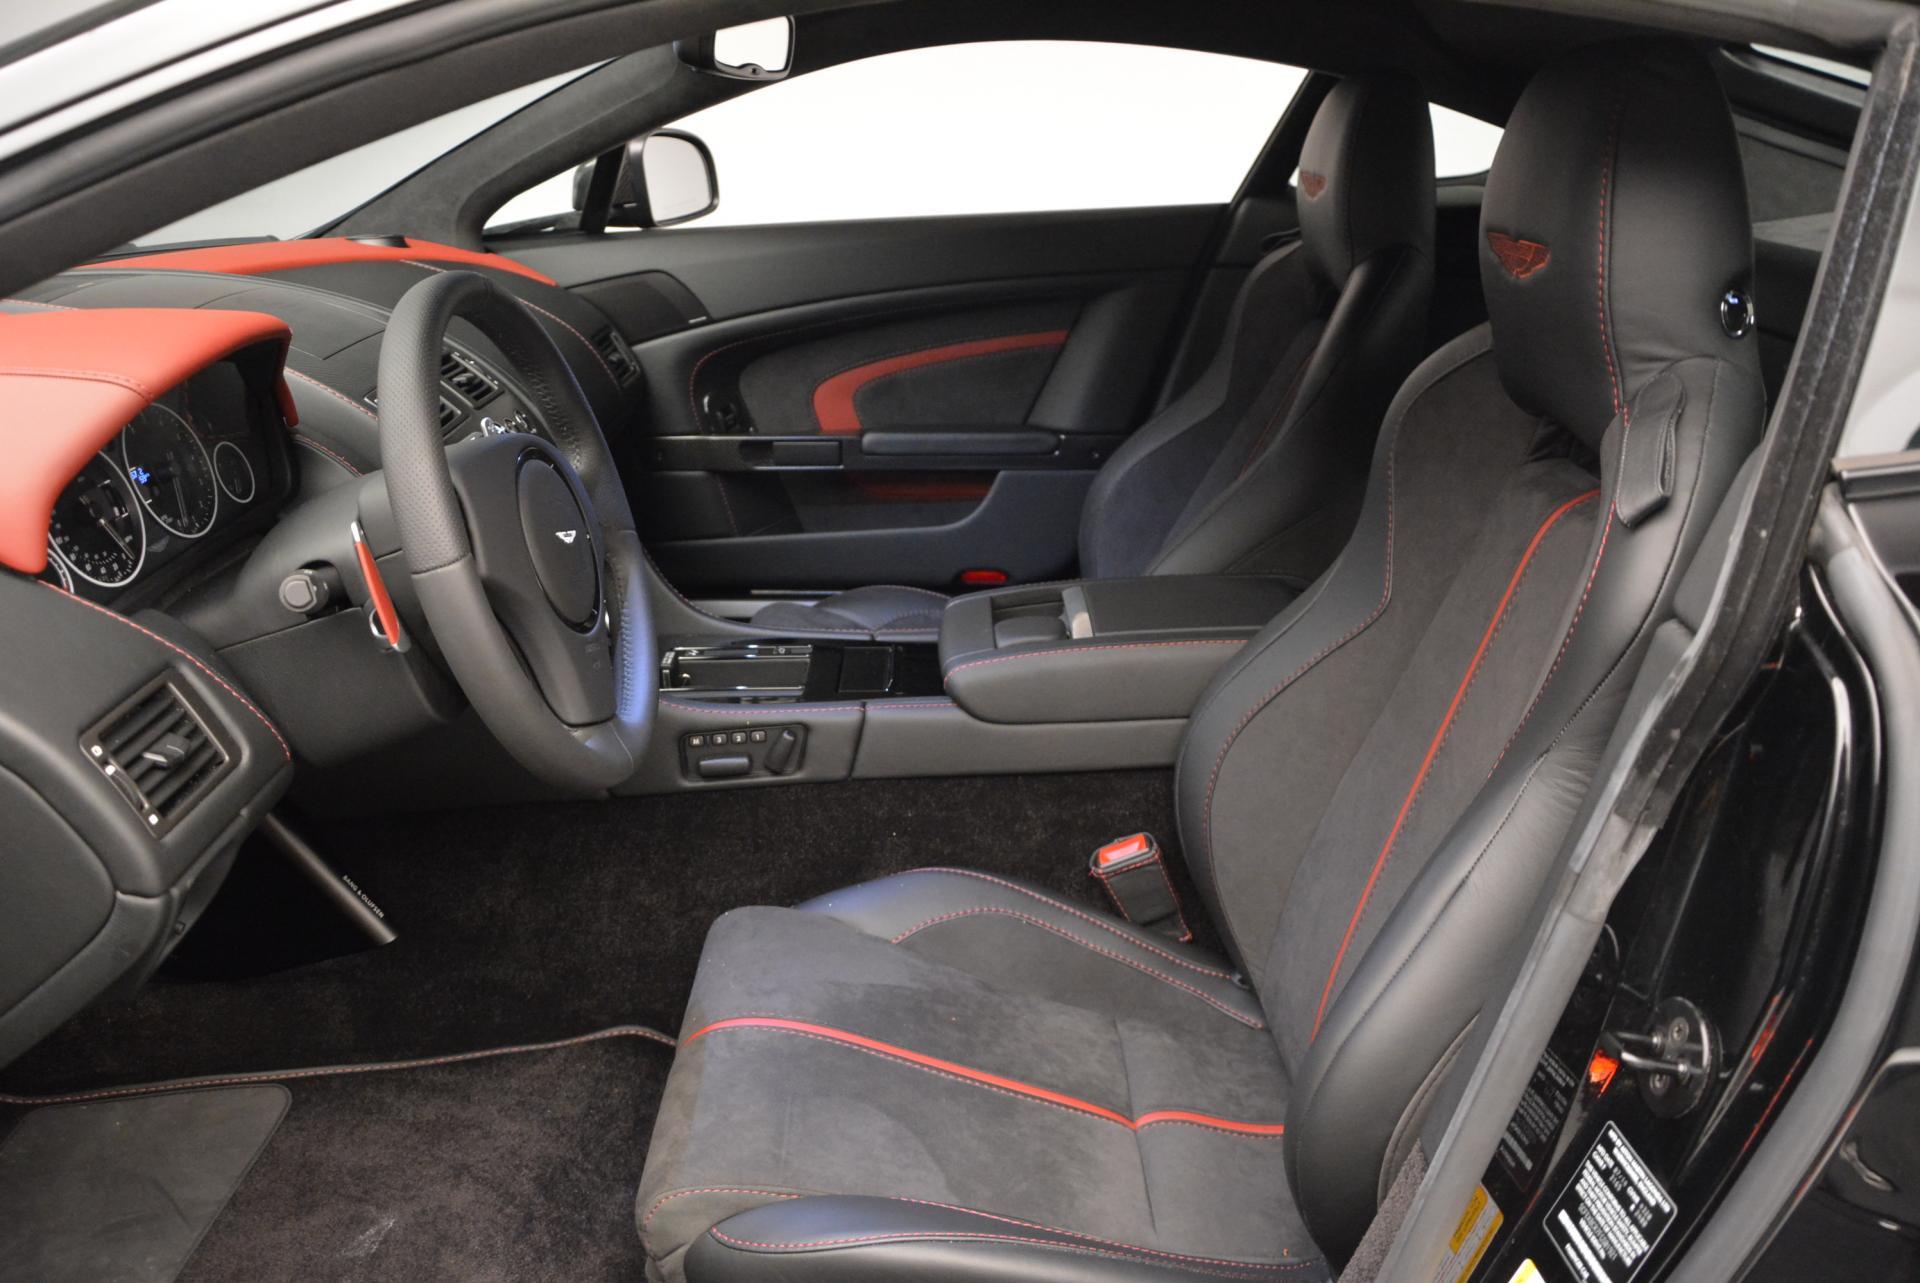 New 2015 Aston Martin V12 Vantage S  For Sale In Greenwich, CT 103_p13